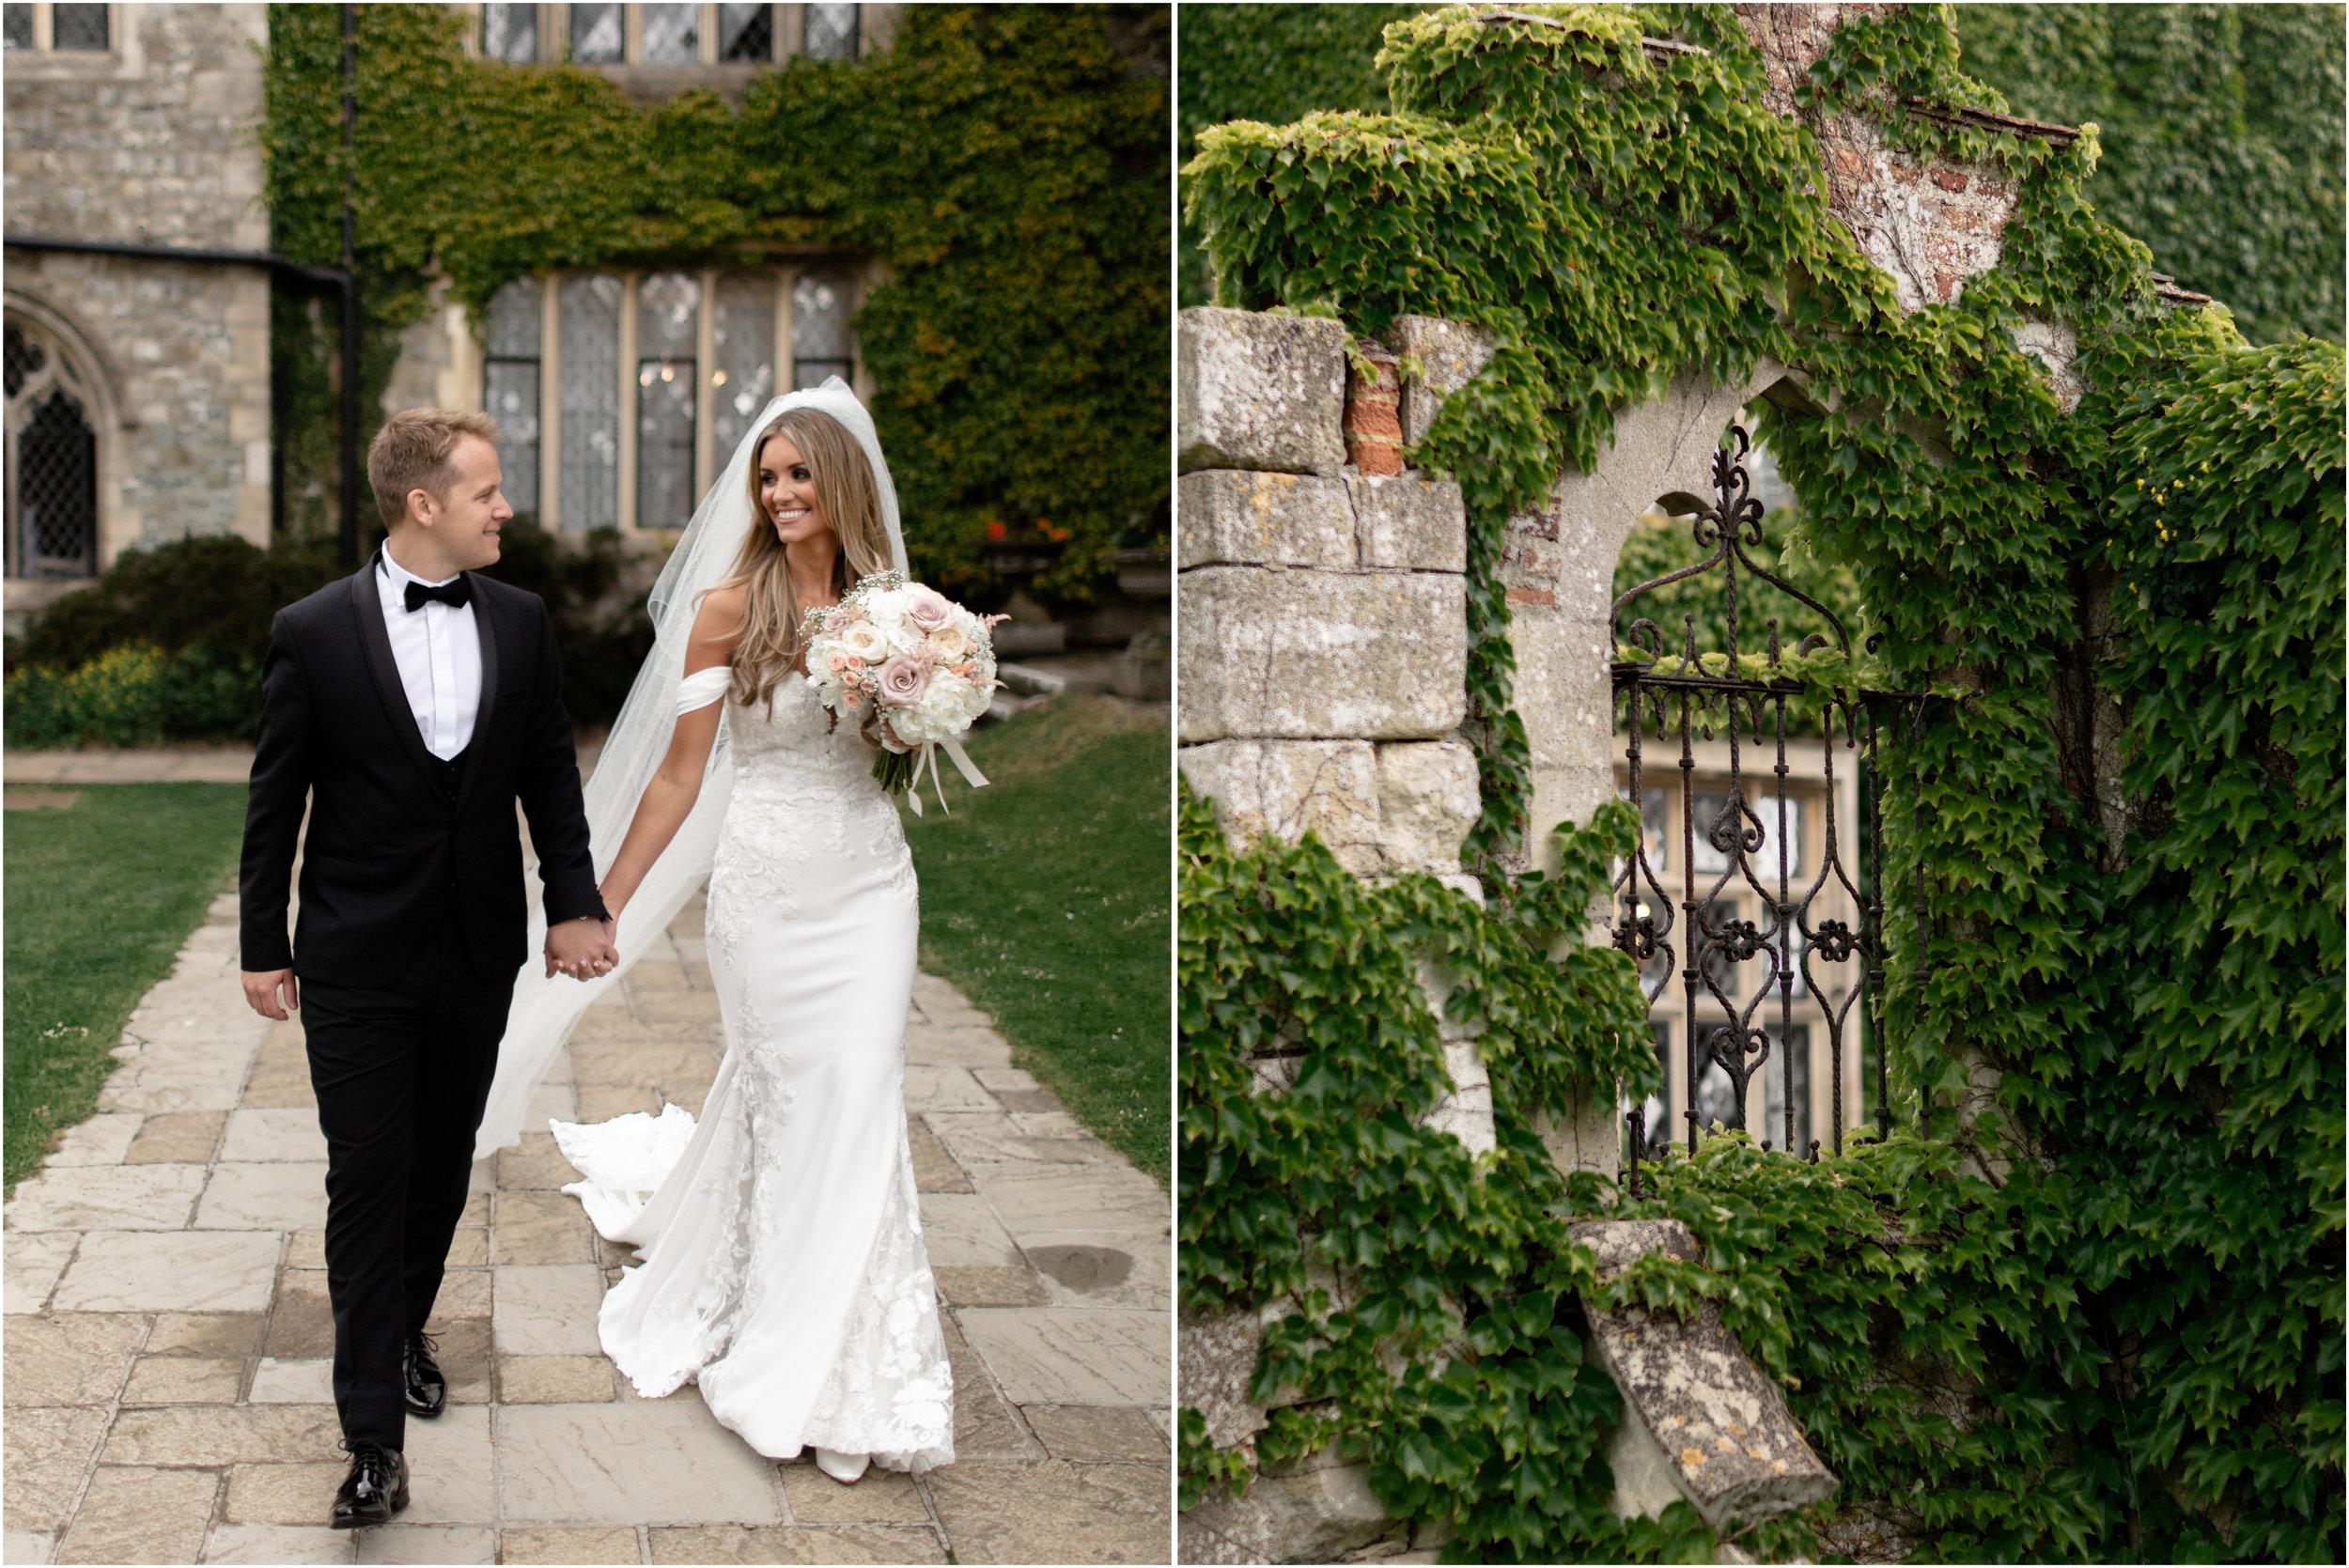 Rebecca Searle Wedding Photography Surrey London Luxury 58.jpg